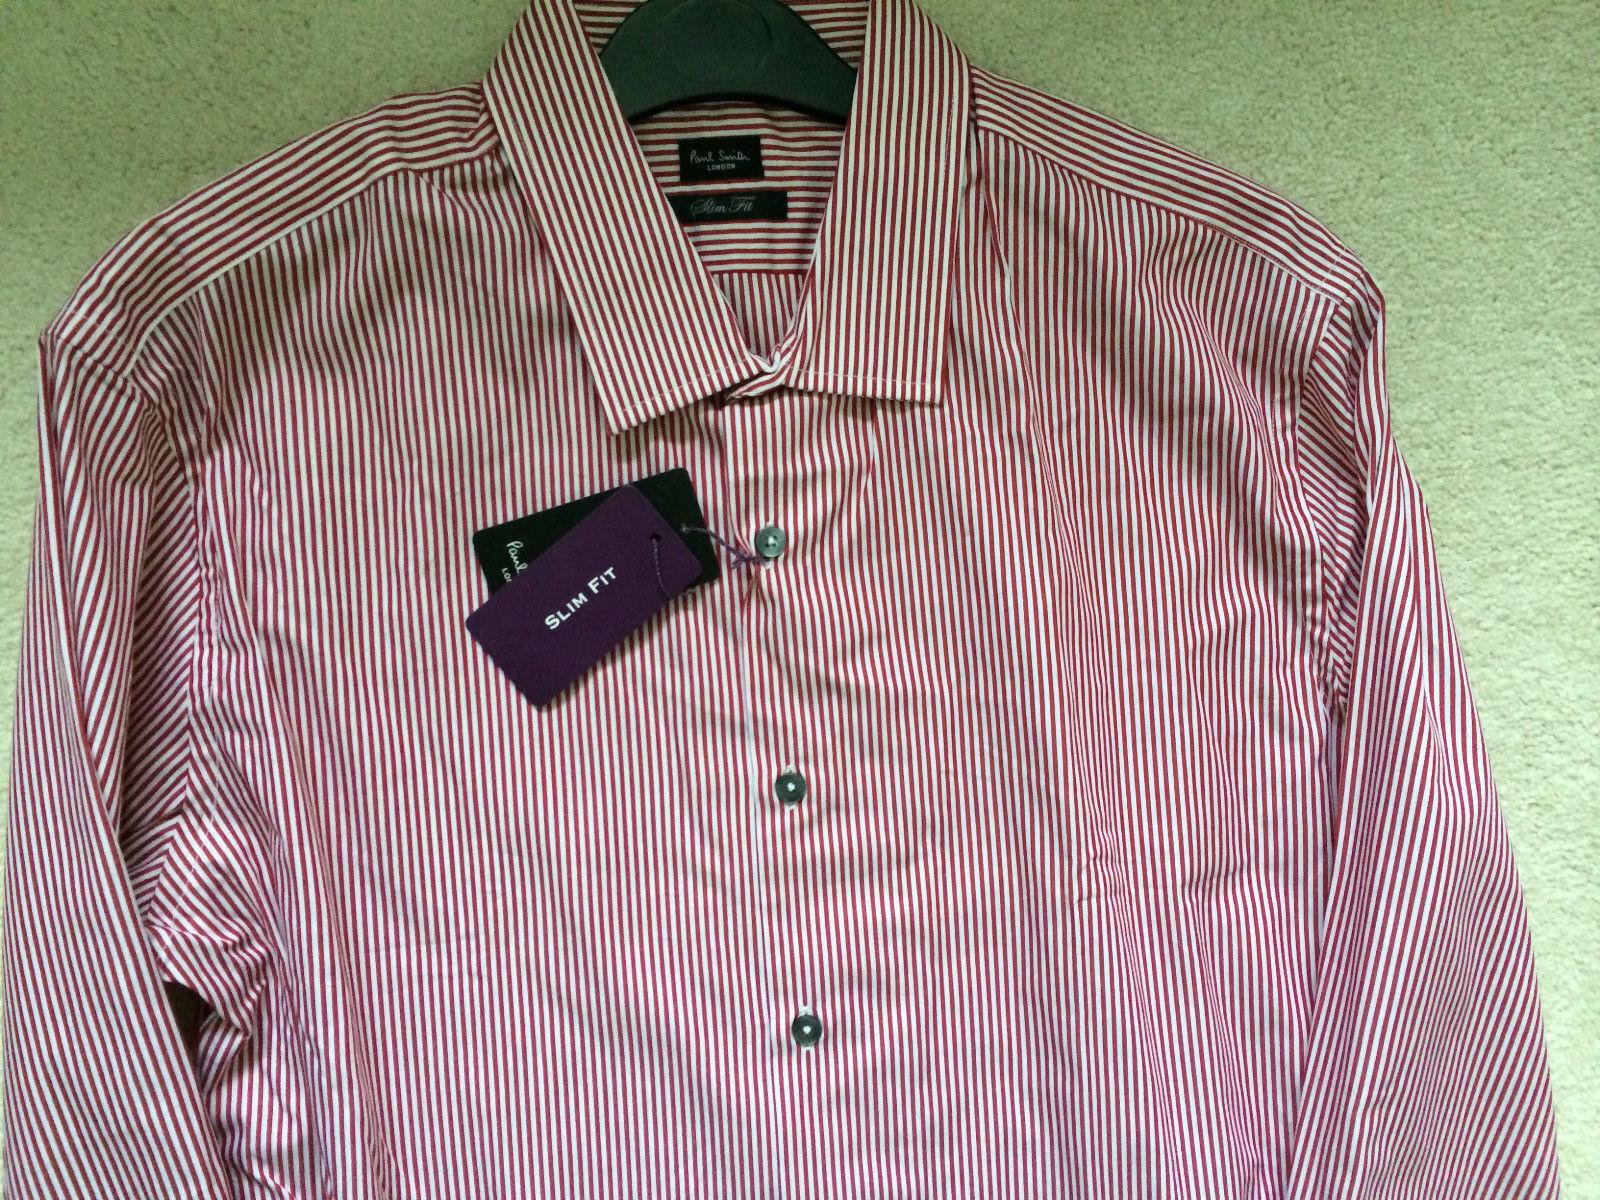 Paul Smith London rosso Stripe LS Shirt-Taglia 17 43-Slim Fit-p2p 22.5